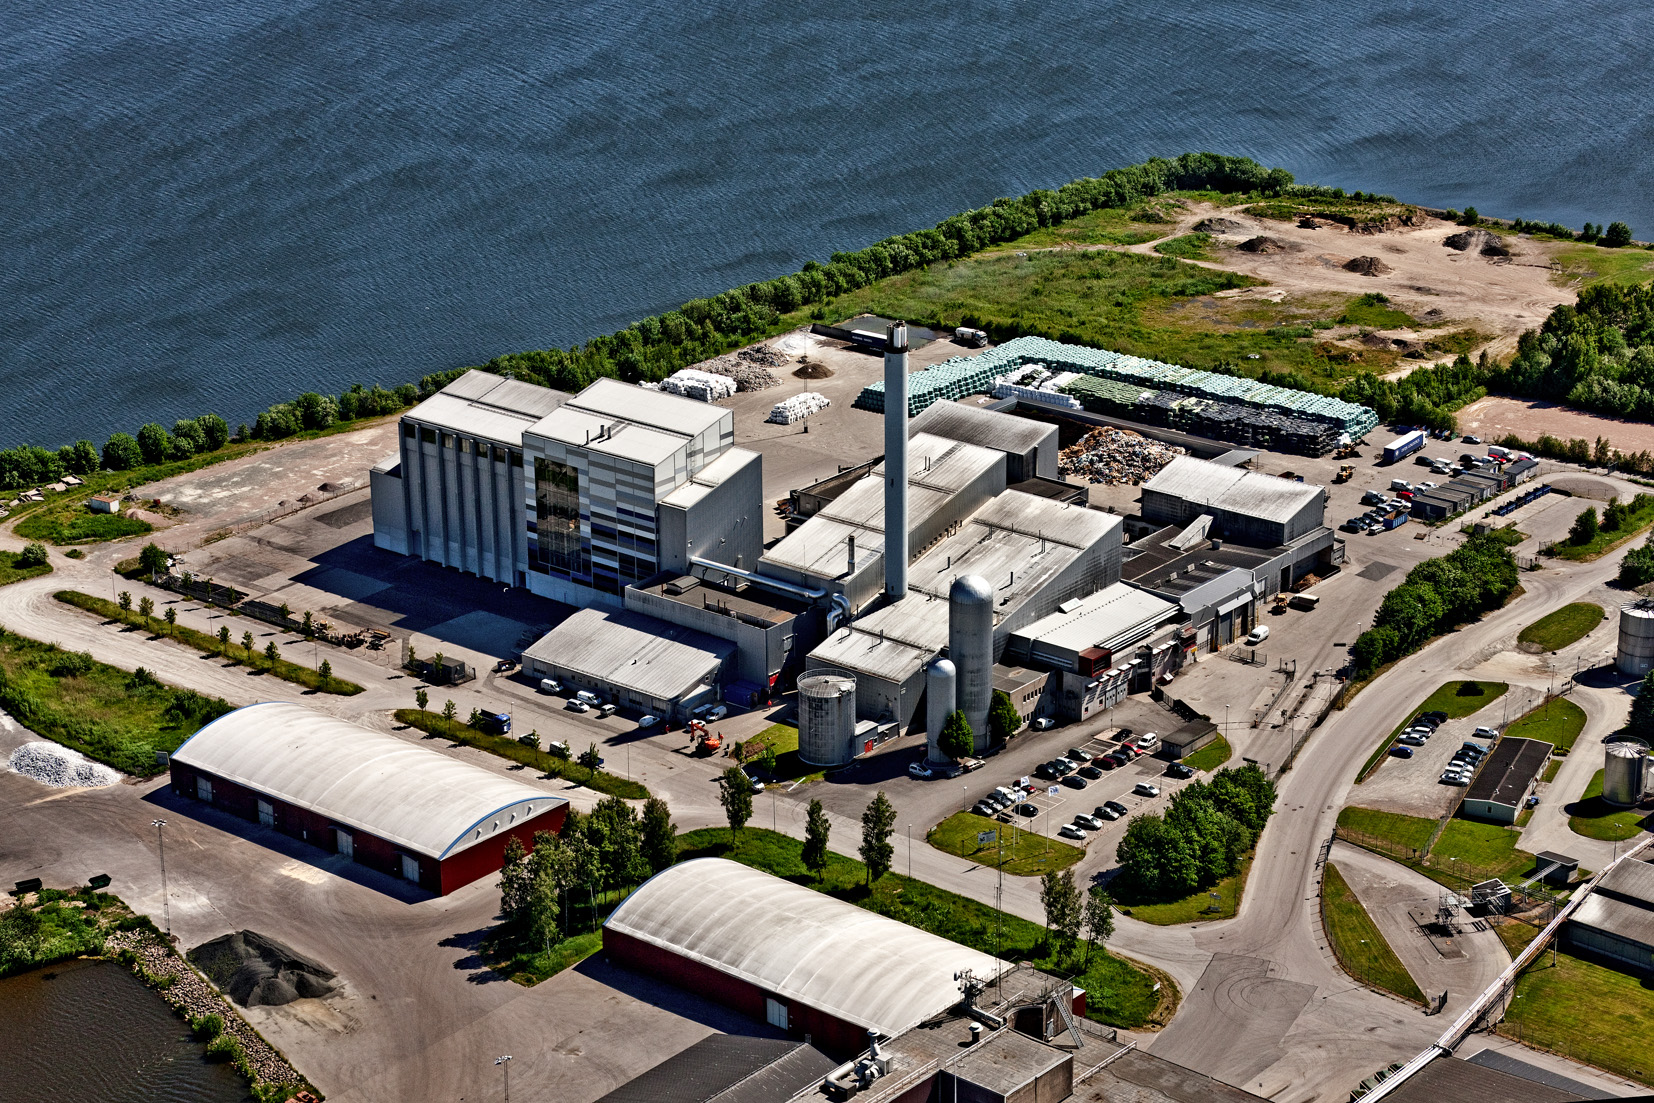 Valmet will supply a waste-fired steam boiler to Lidköping Energi AB in Lidköping, Sweden.